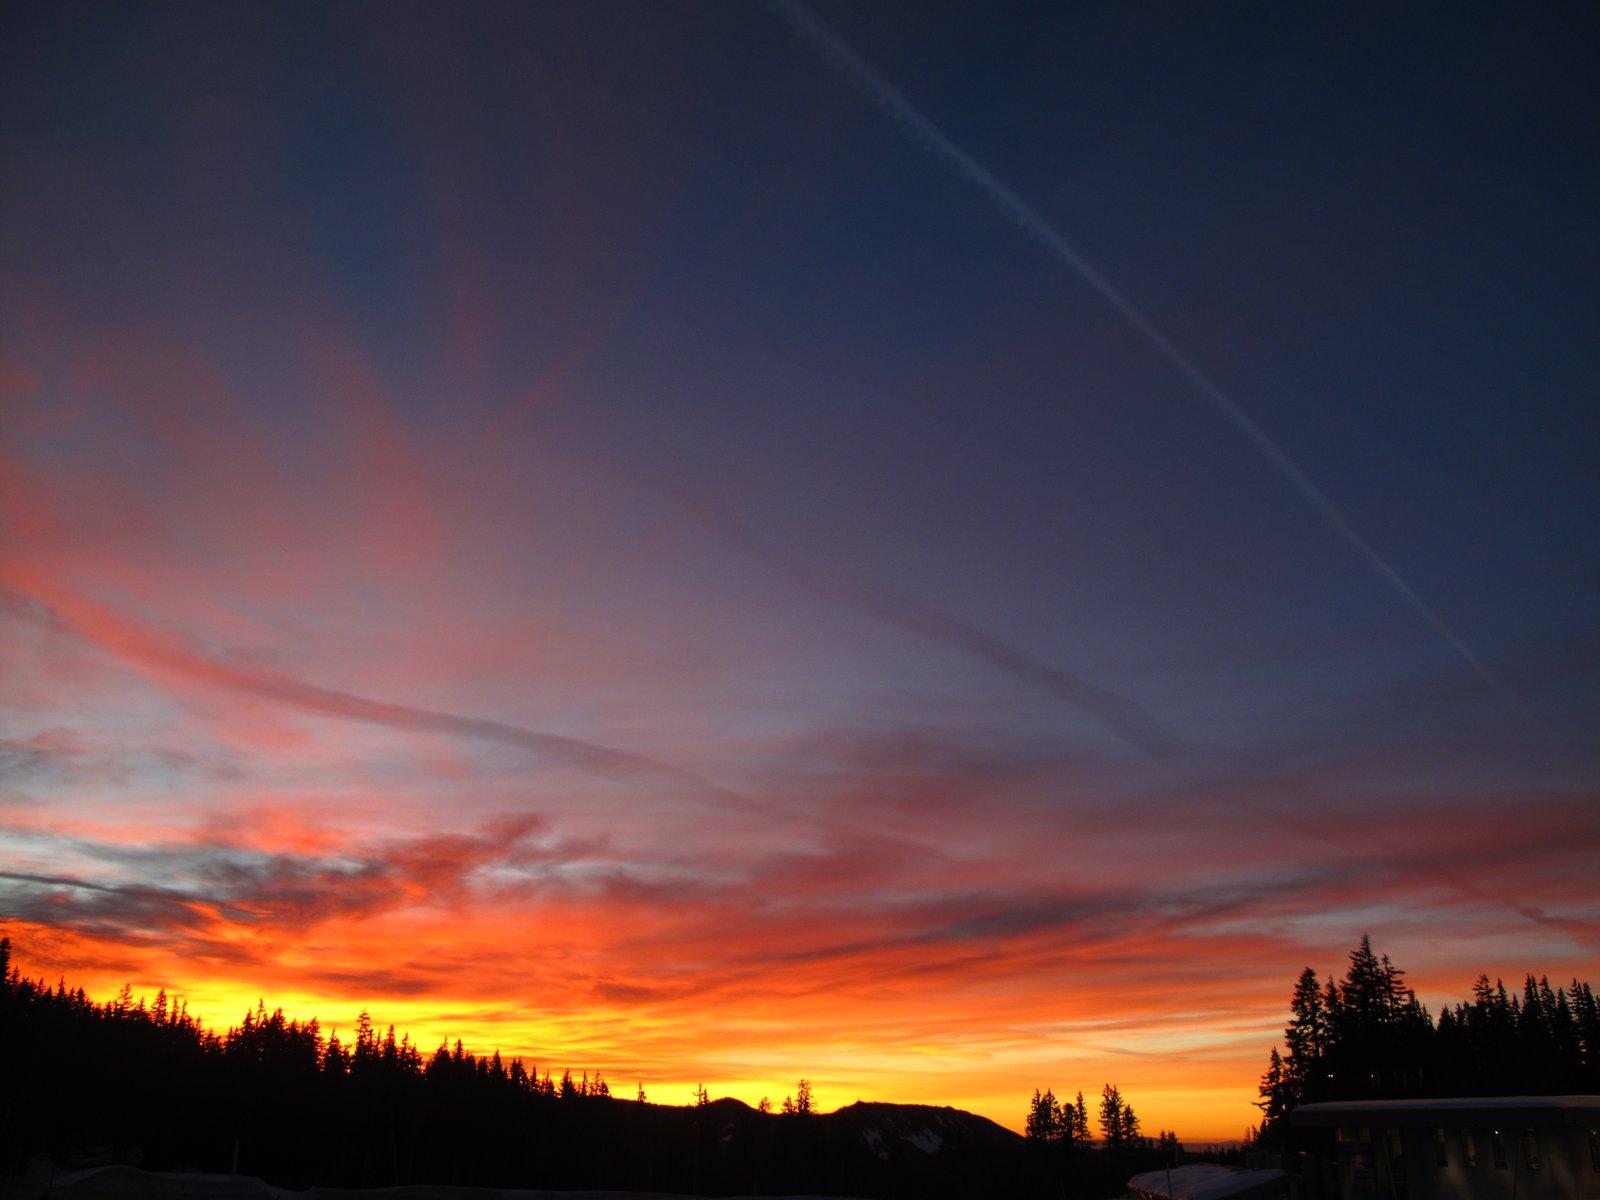 Sunrise January 18, 2013